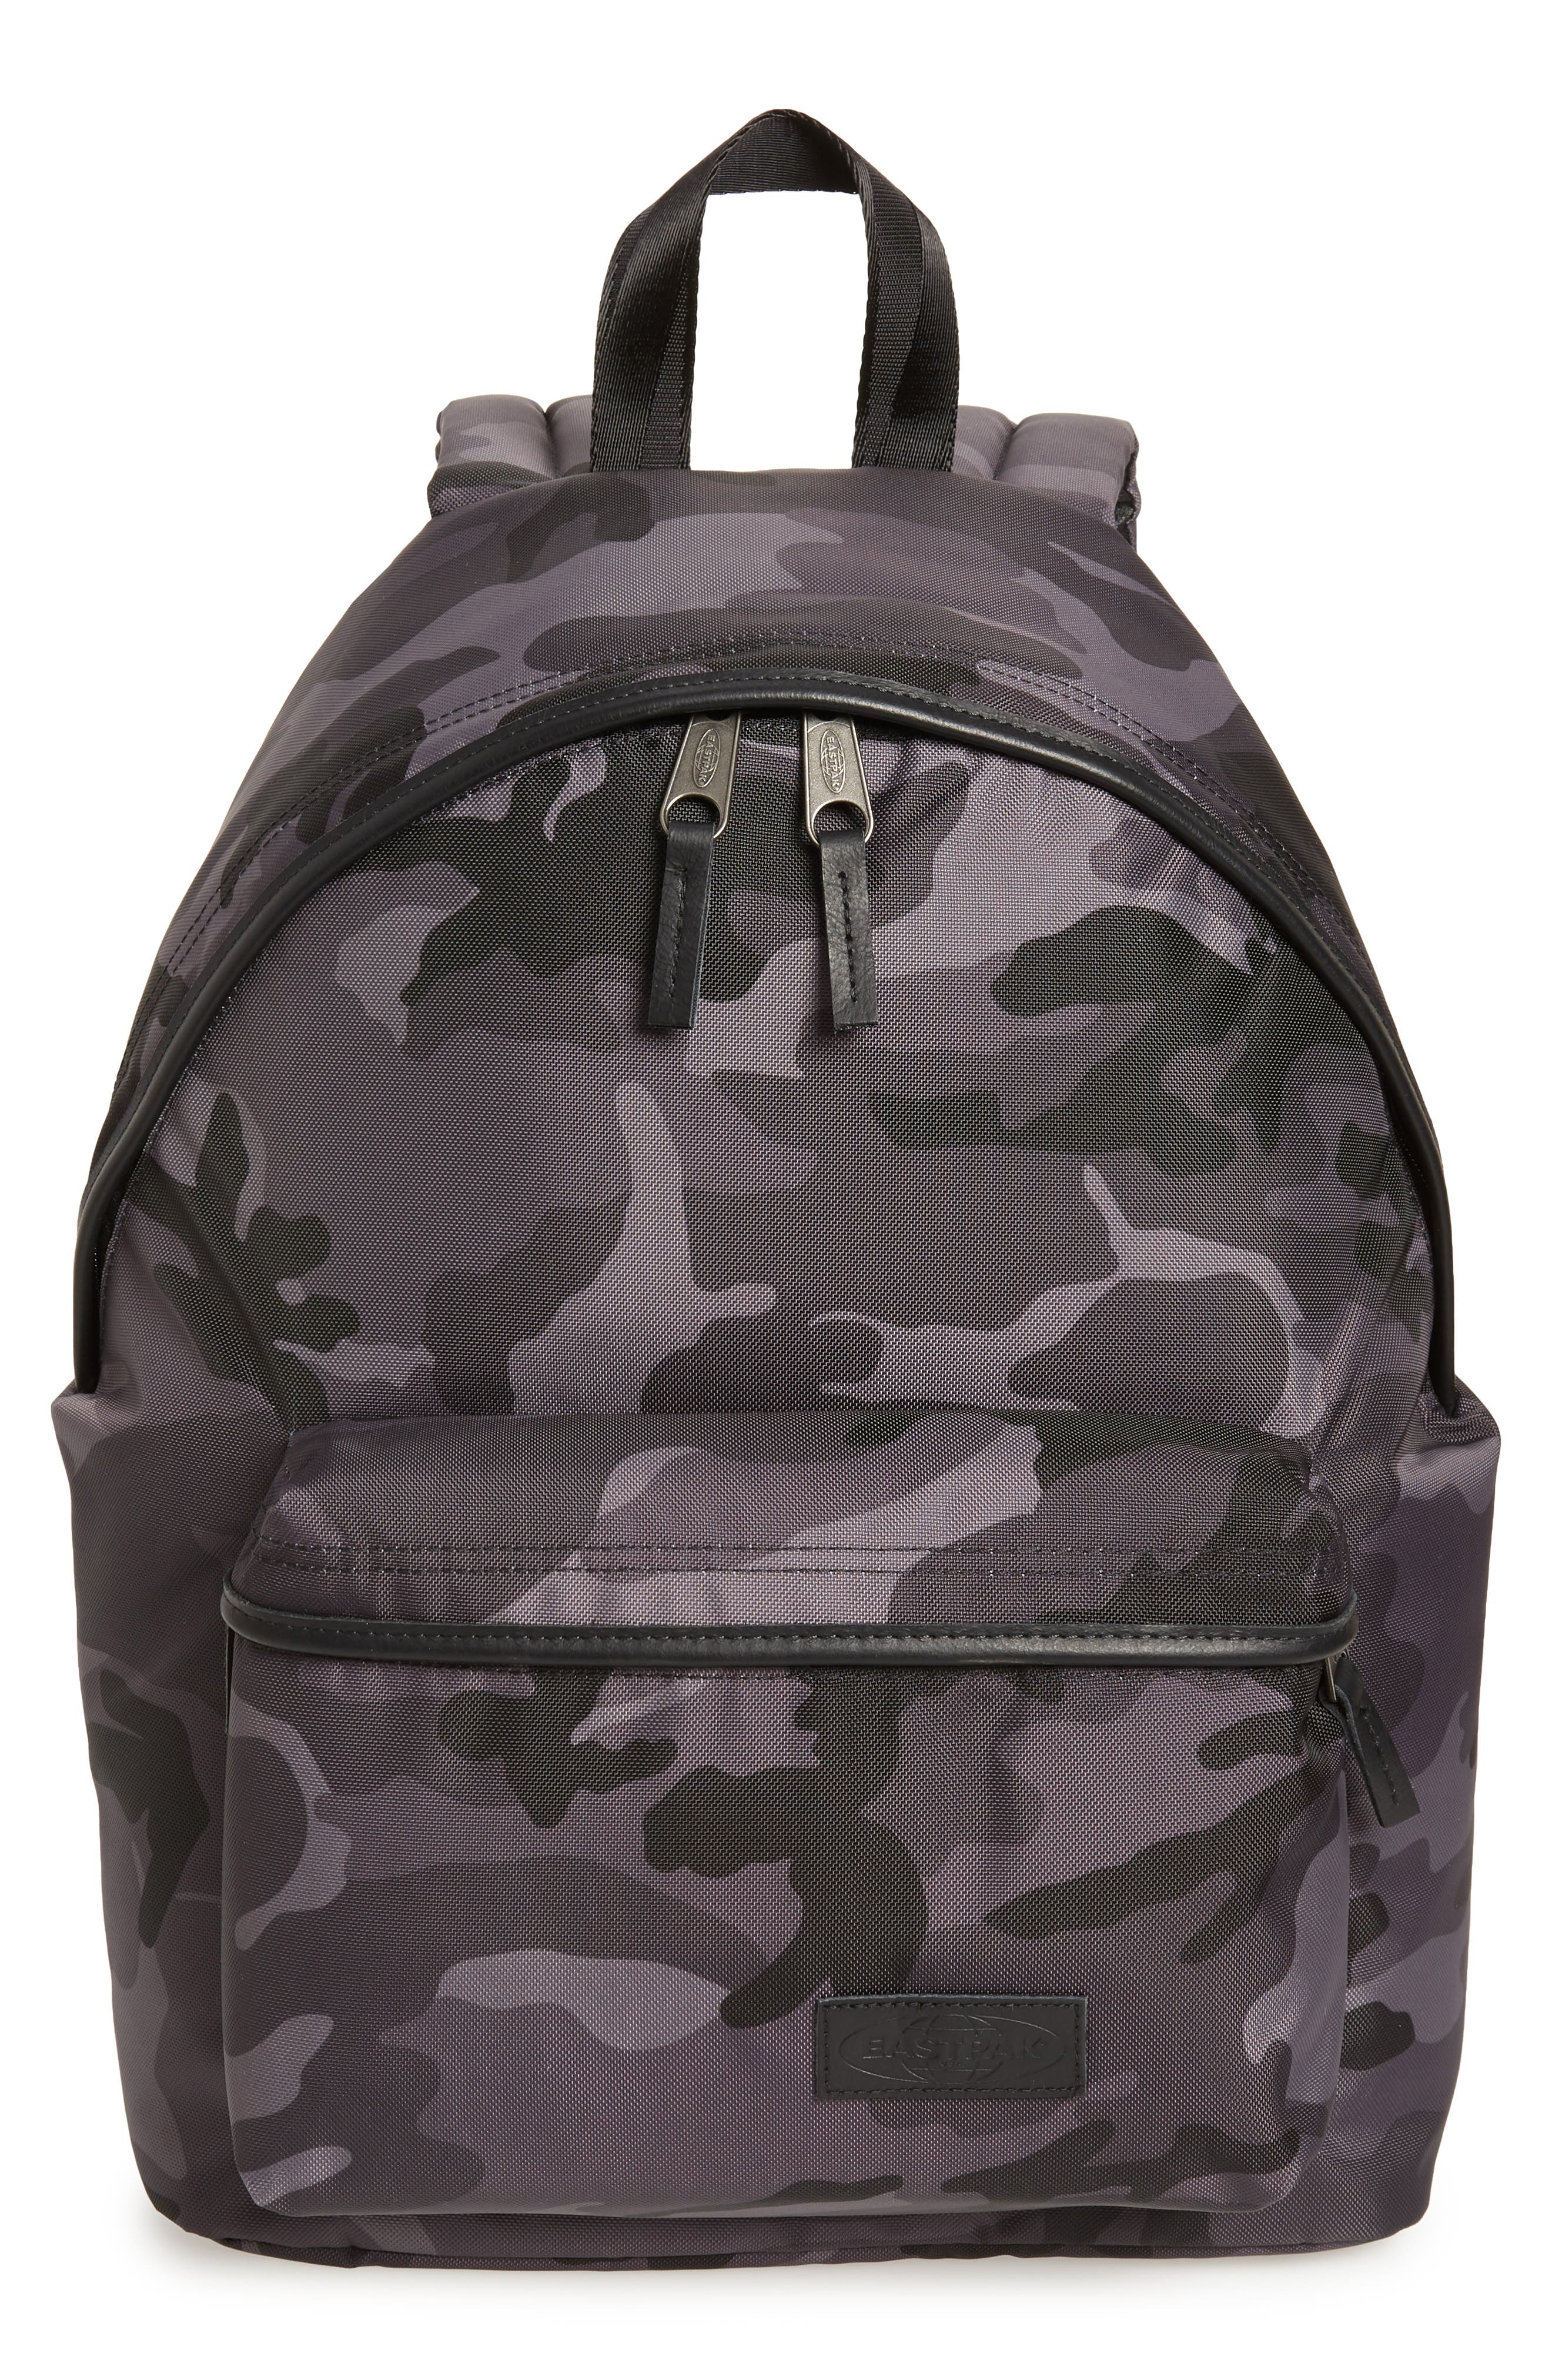 Eastpak Padded Pakr Backpack - Grey